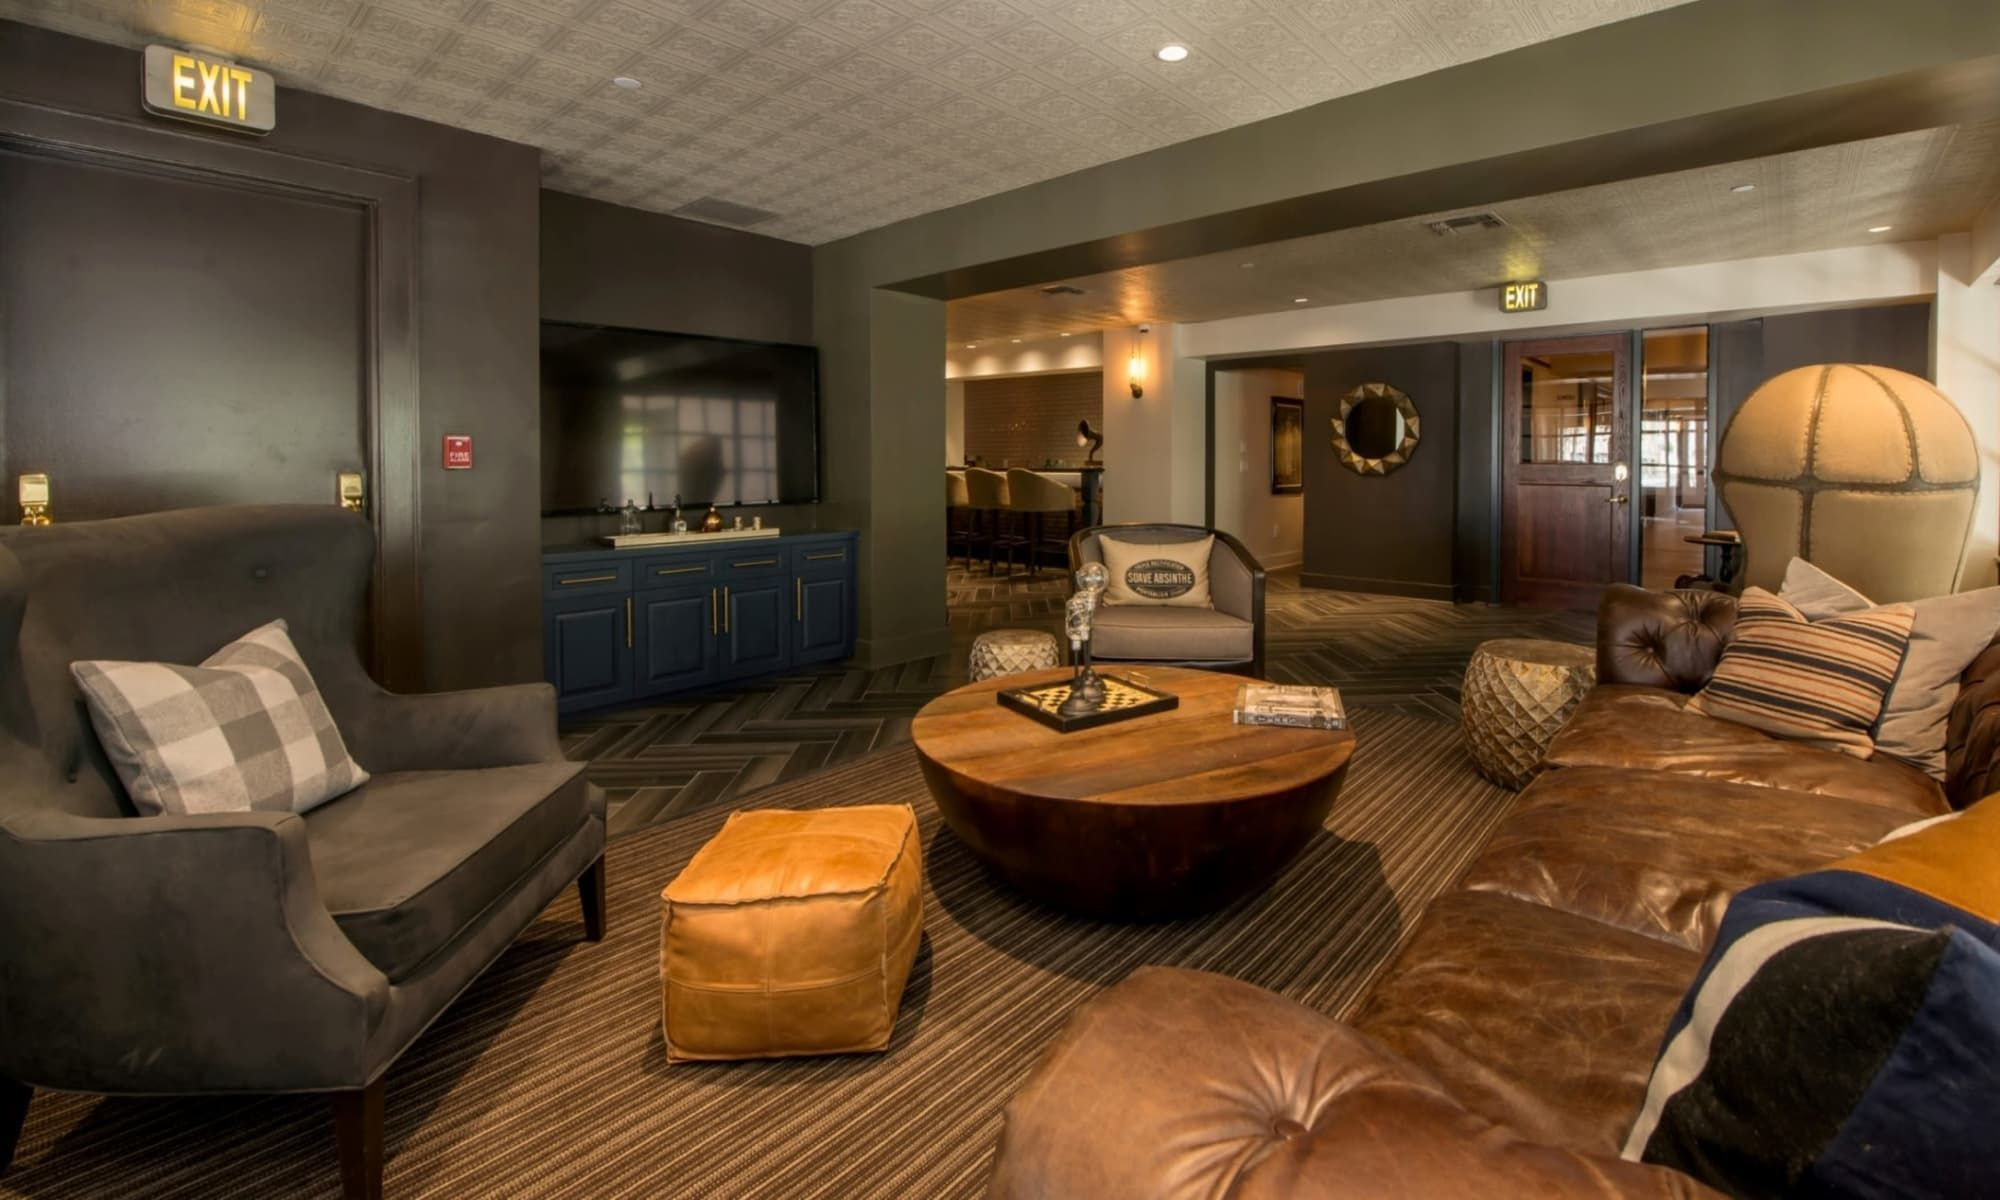 14 Cozy Bedroom Apartment San Antonio Renting a house